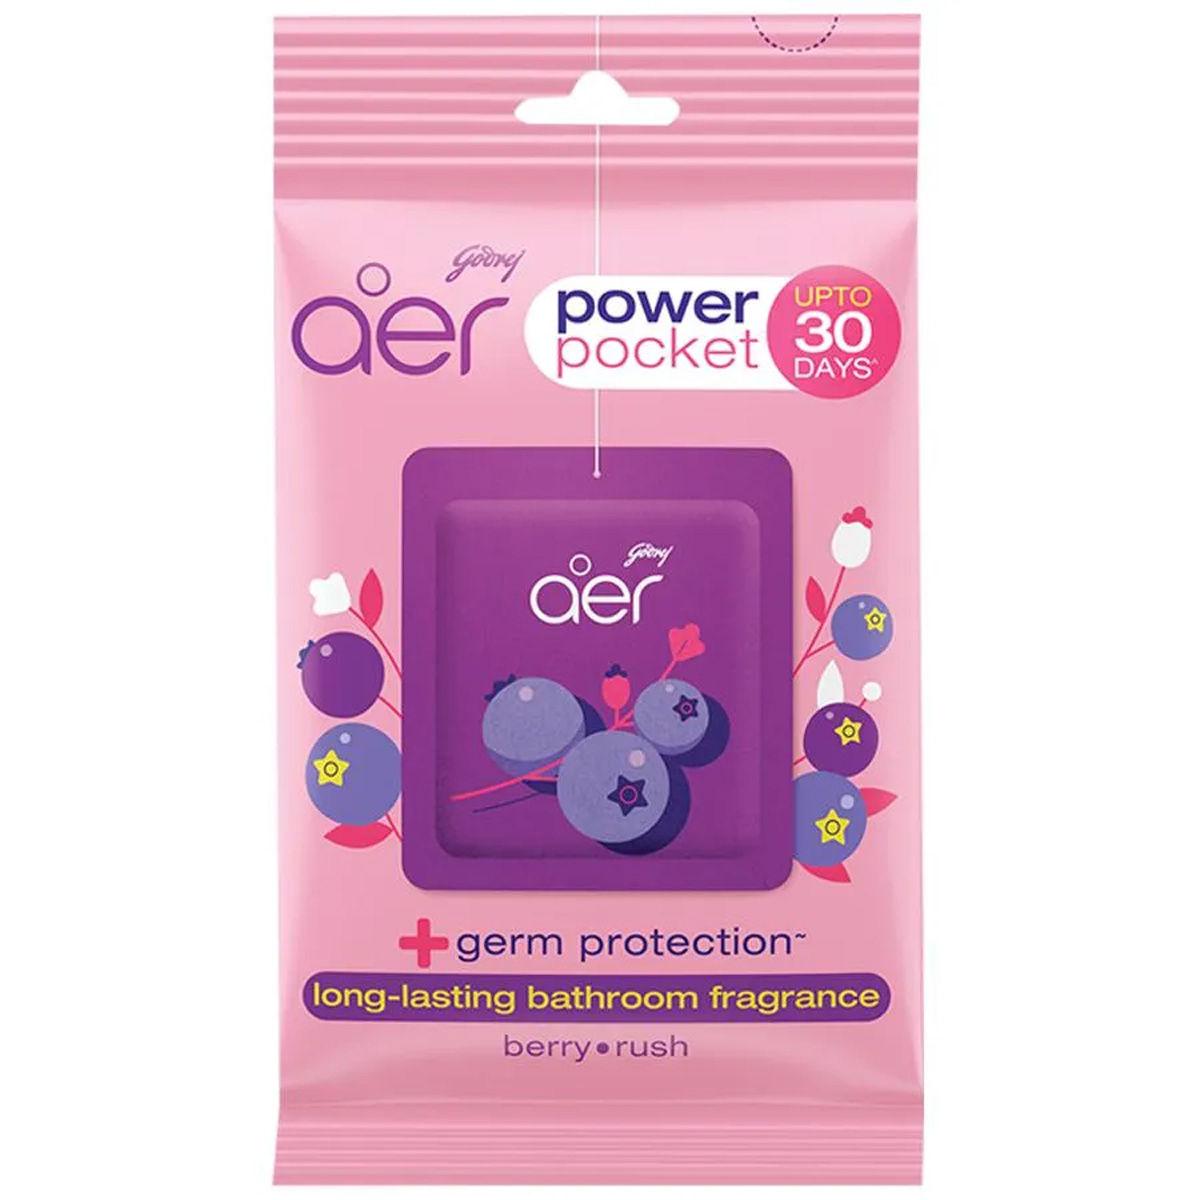 Godrej Aer Power Pocket Berry Rush Bathroom Fragrance, 10 gm, Pack of 1